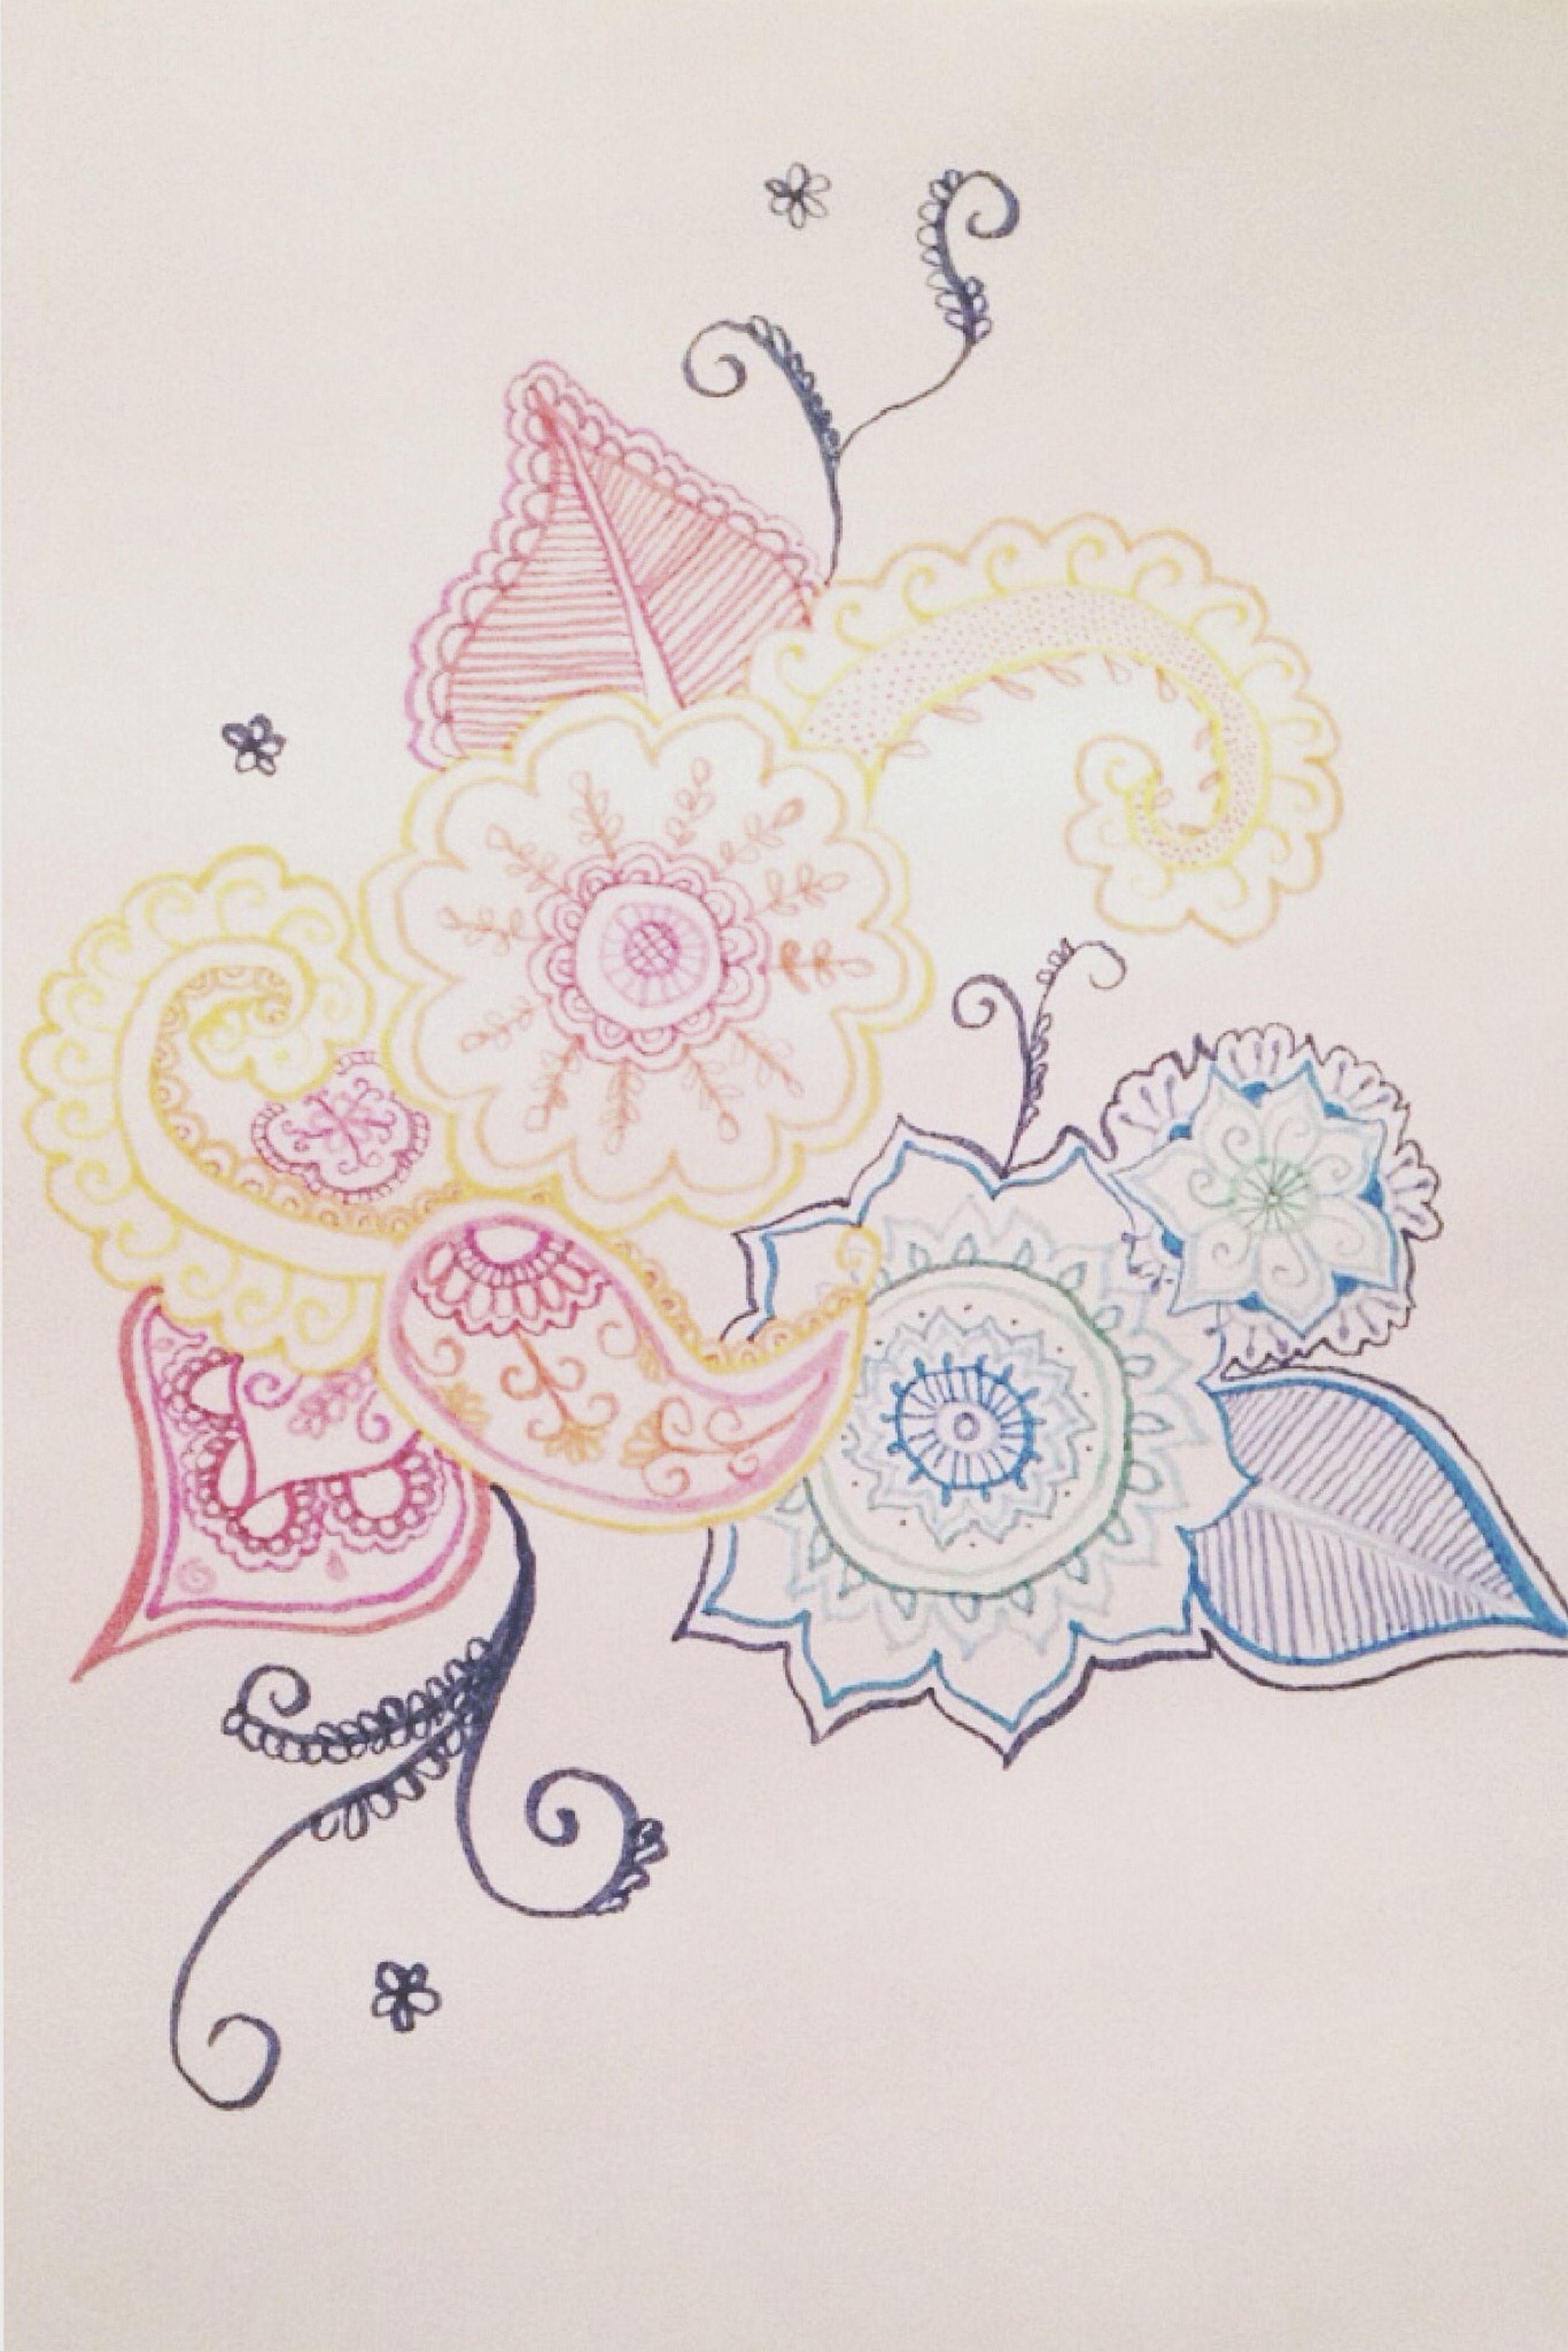 indoors, art and craft, art, creativity, studio shot, text, western script, white background, design, close-up, human representation, still life, wall - building feature, floral pattern, paper, craft, pattern, communication, ideas, animal representation